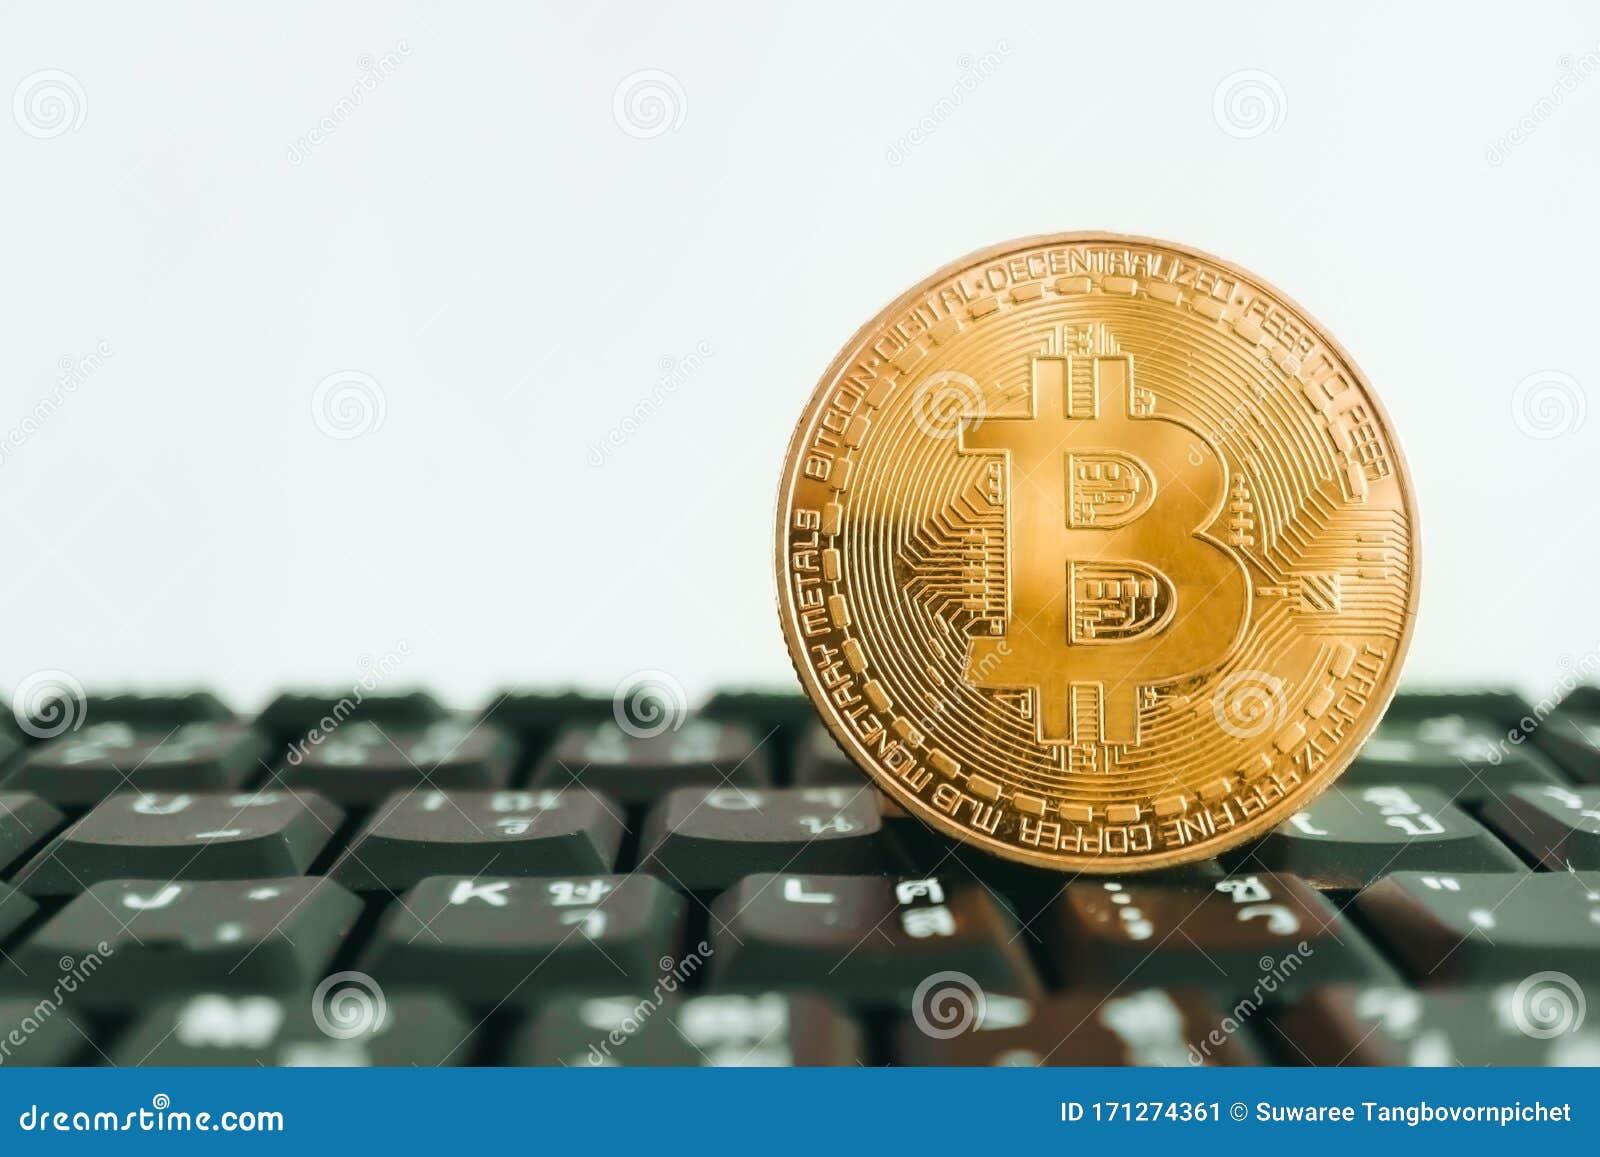 future money cryptocurrency